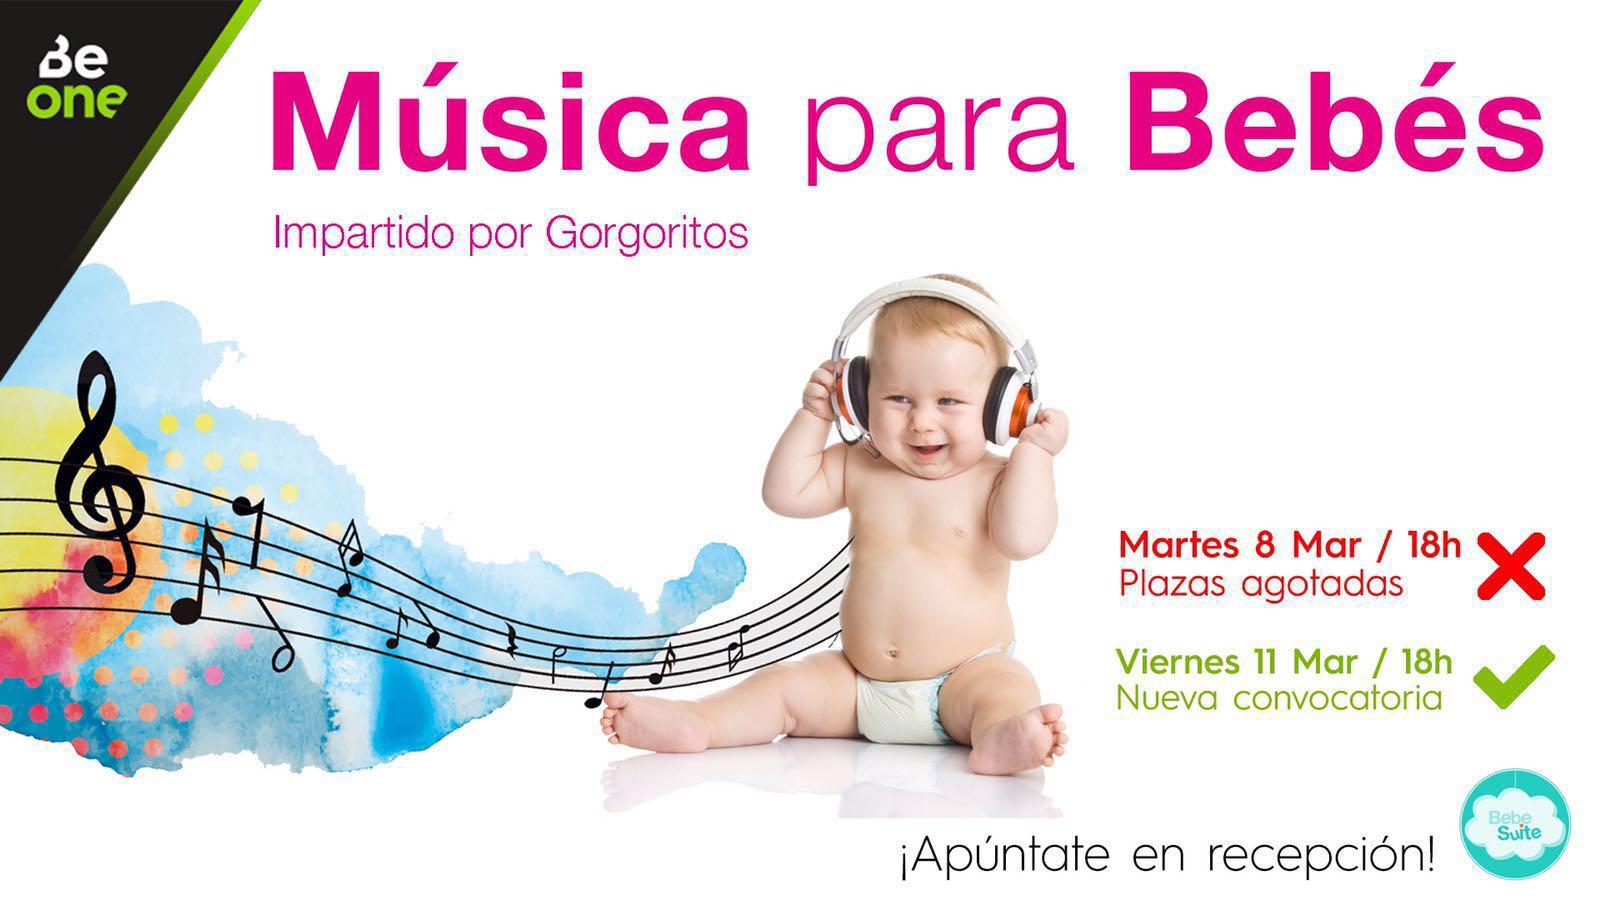 Merienda Musical Gorgoritos Be one